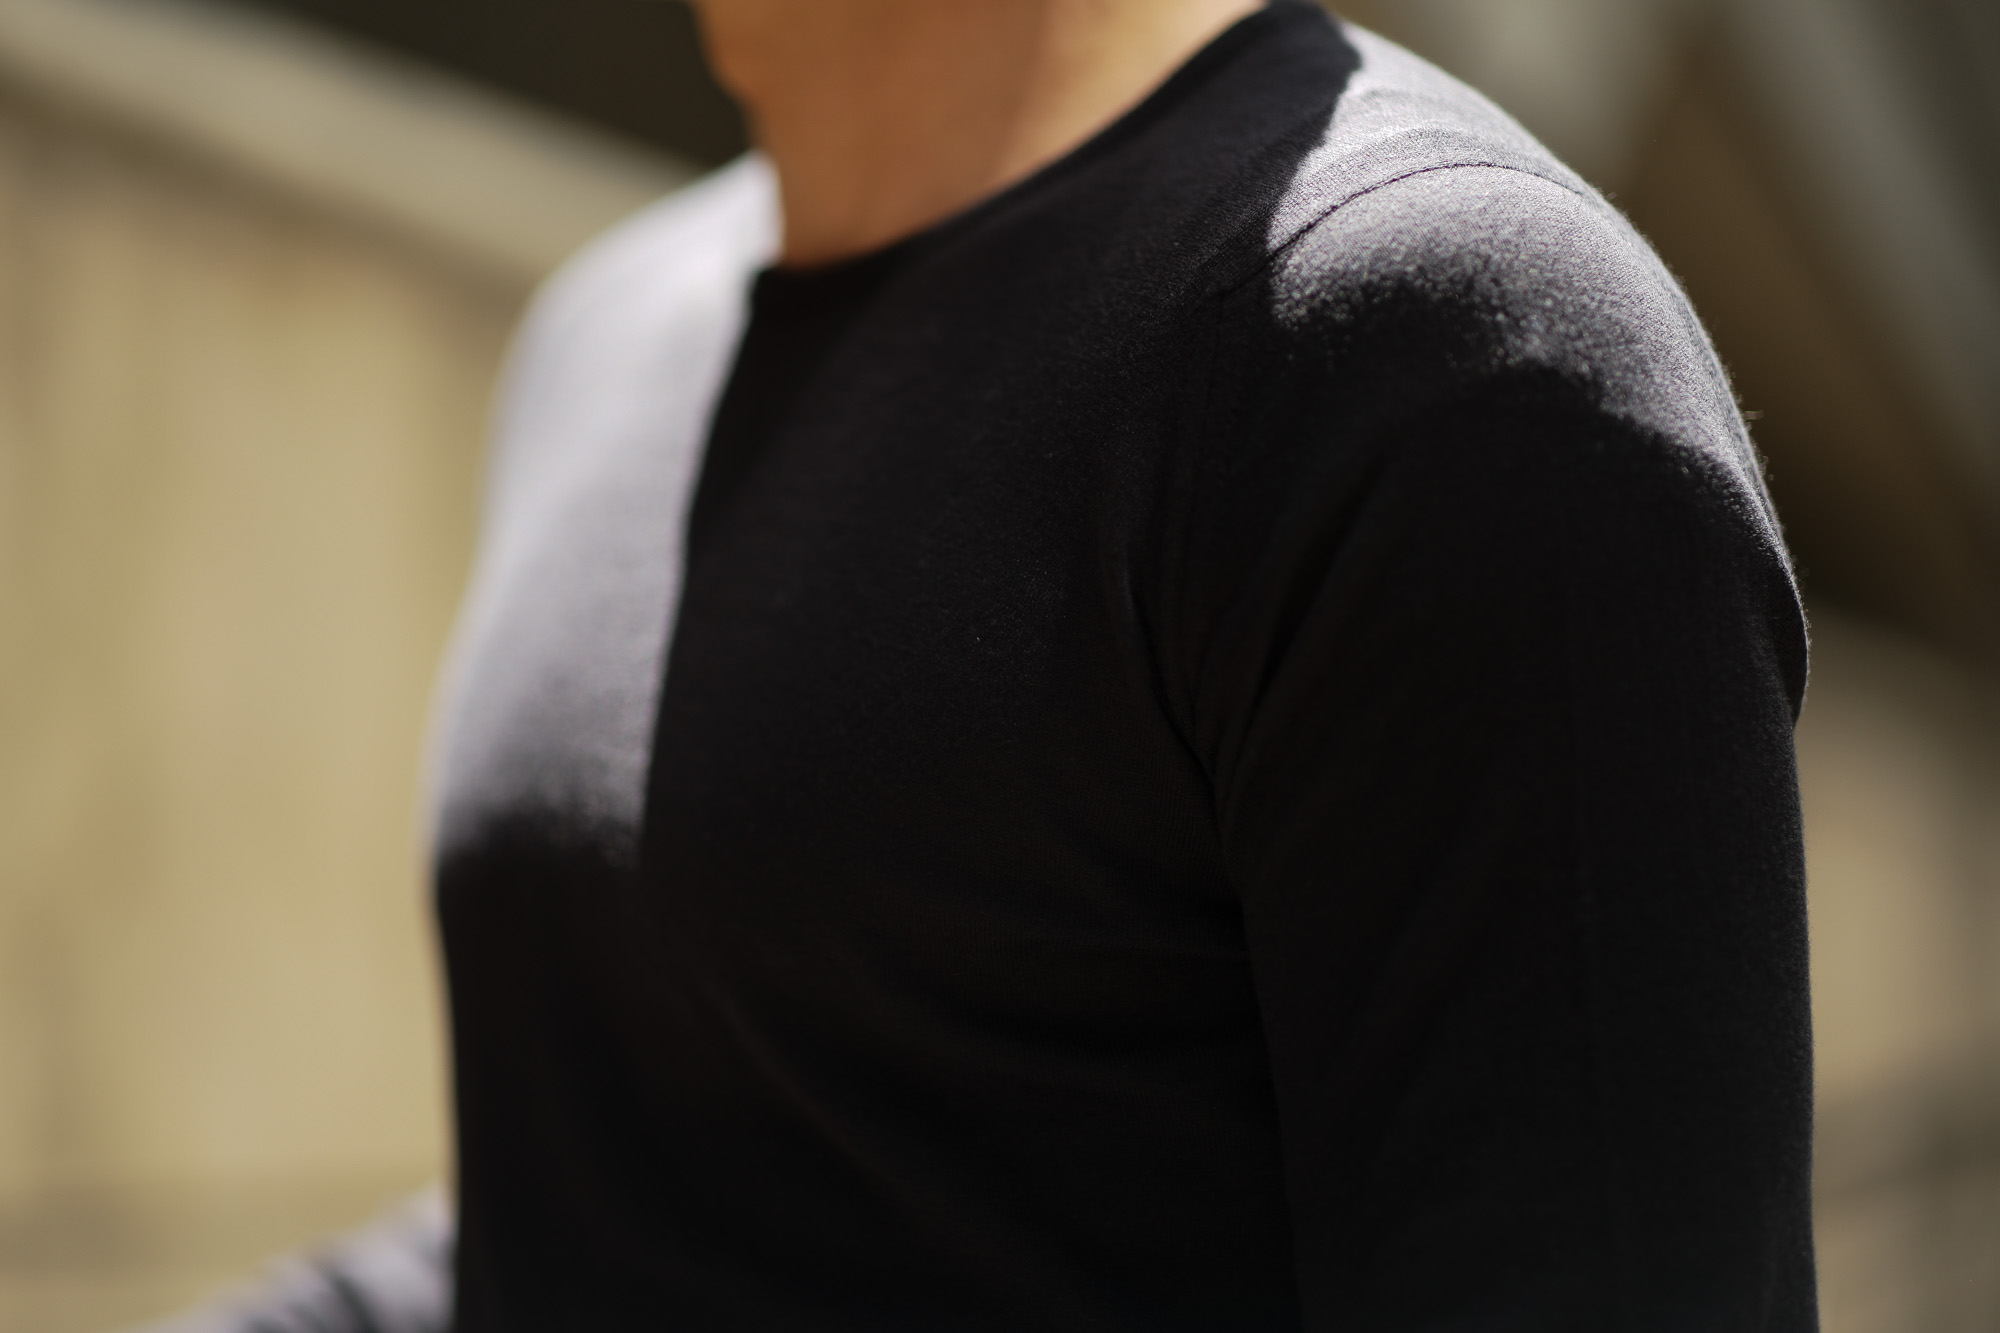 JOHN SMEDLEY (ジョンスメドレー) IMPERIAL KASHMIR (カシミアシリーズ) THEON (テオン) CASHMERE × SEA ISLAND COTTON コットンカシミヤニット セーター BLACK(ブラック) Made in England (イギリス製) 2019 春夏新作 johnsmedley 愛知 名古屋 altoediritto アルトエデリット